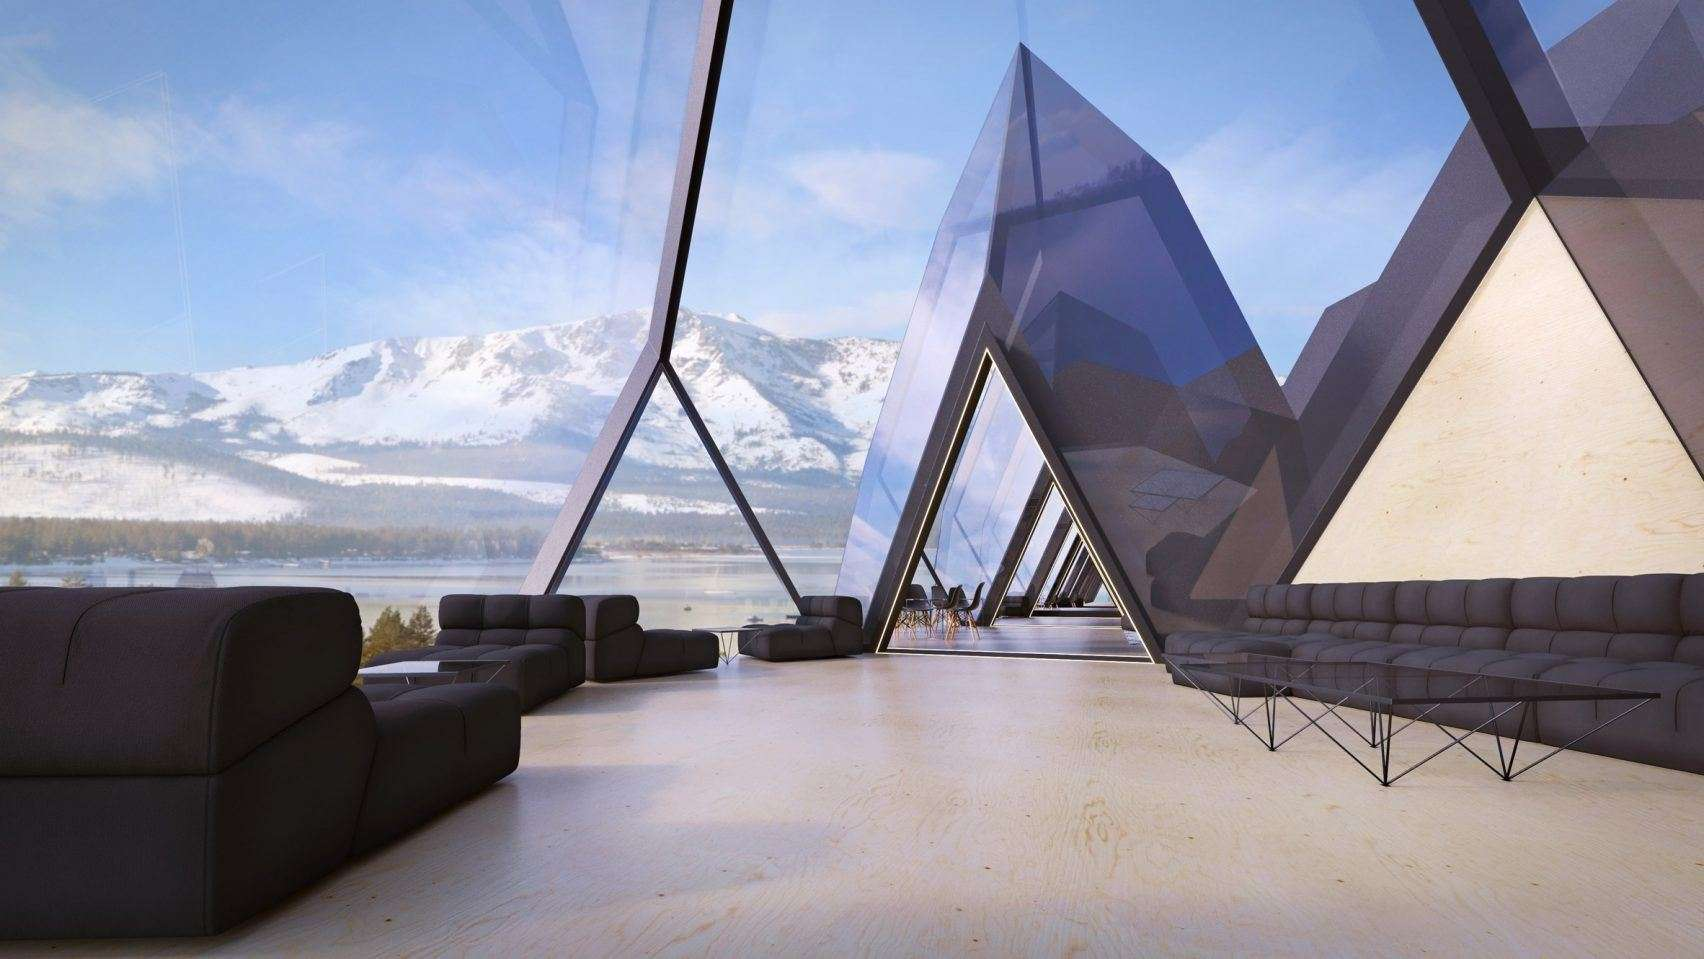 tetra-hotel-wsp-architecture-pod-modular_dezeen_2364_col_3-1704x959